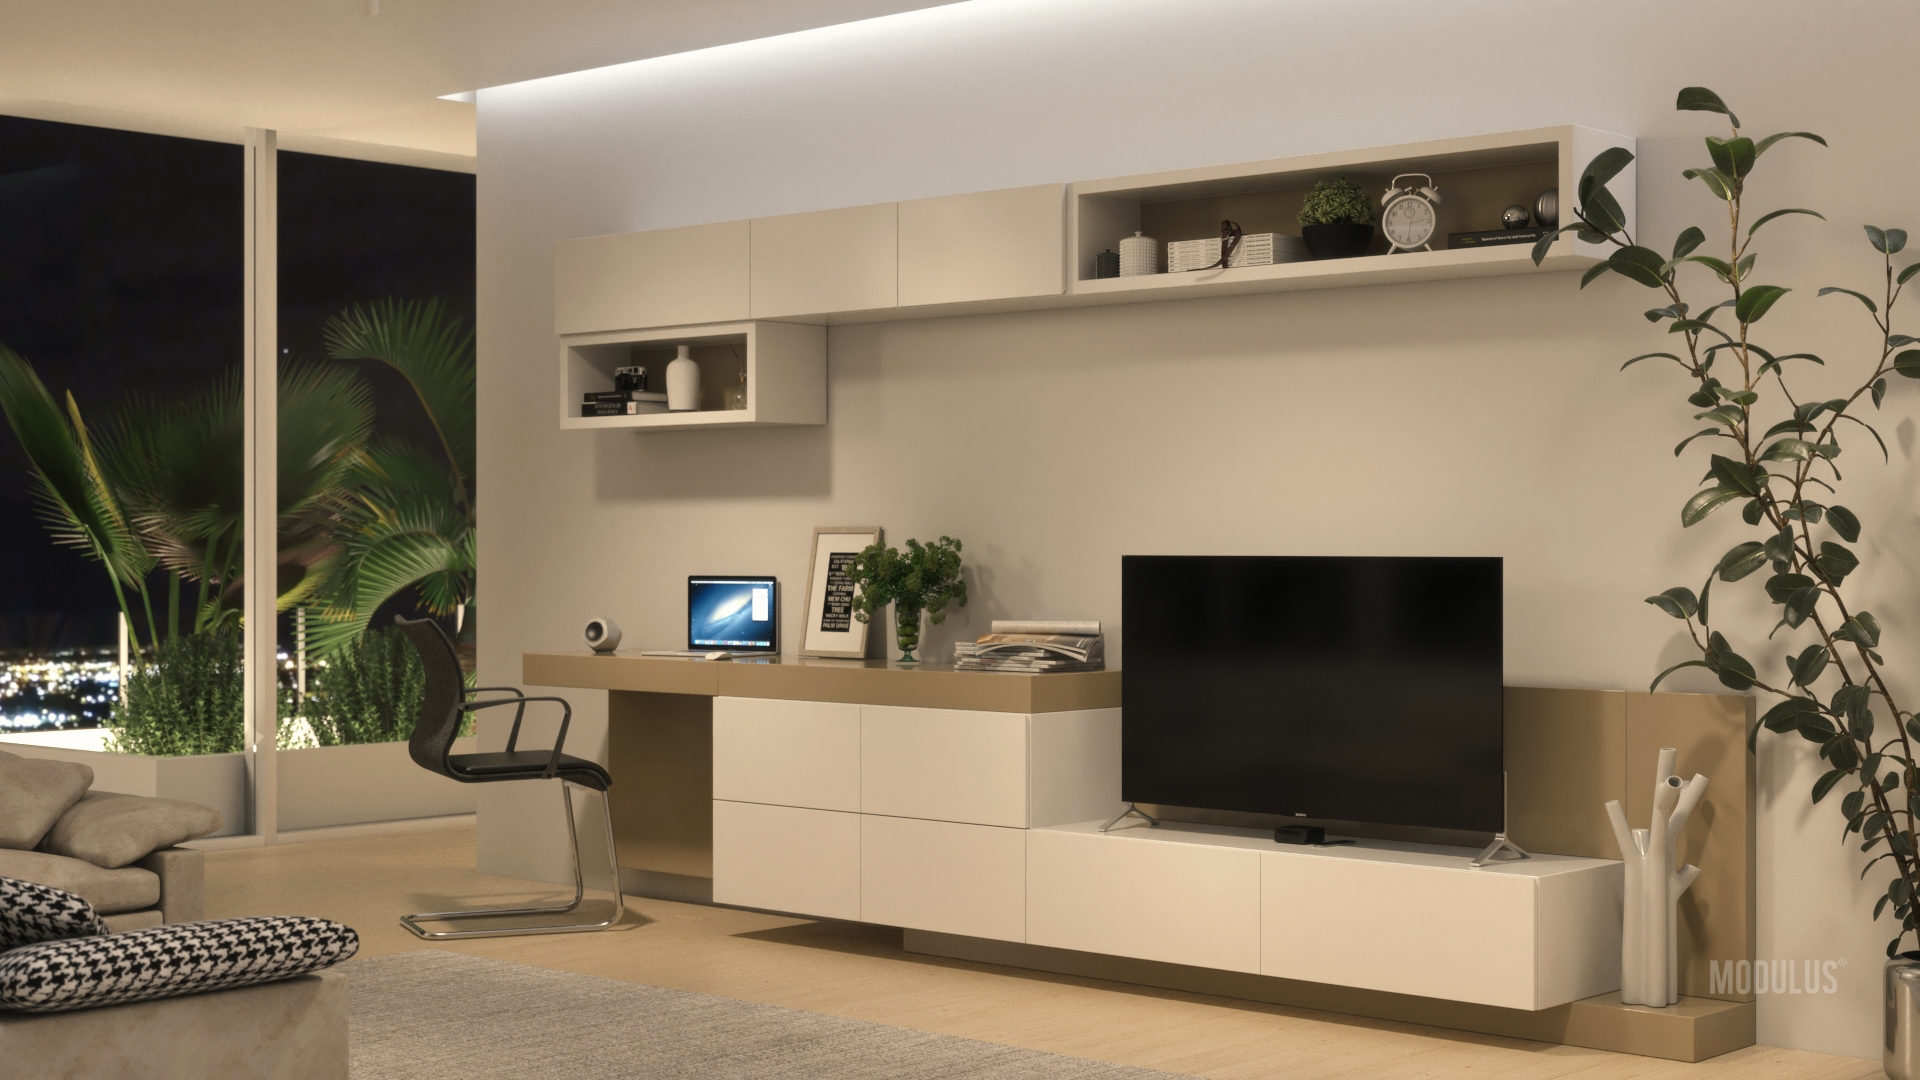 Mueble para living con escritorio